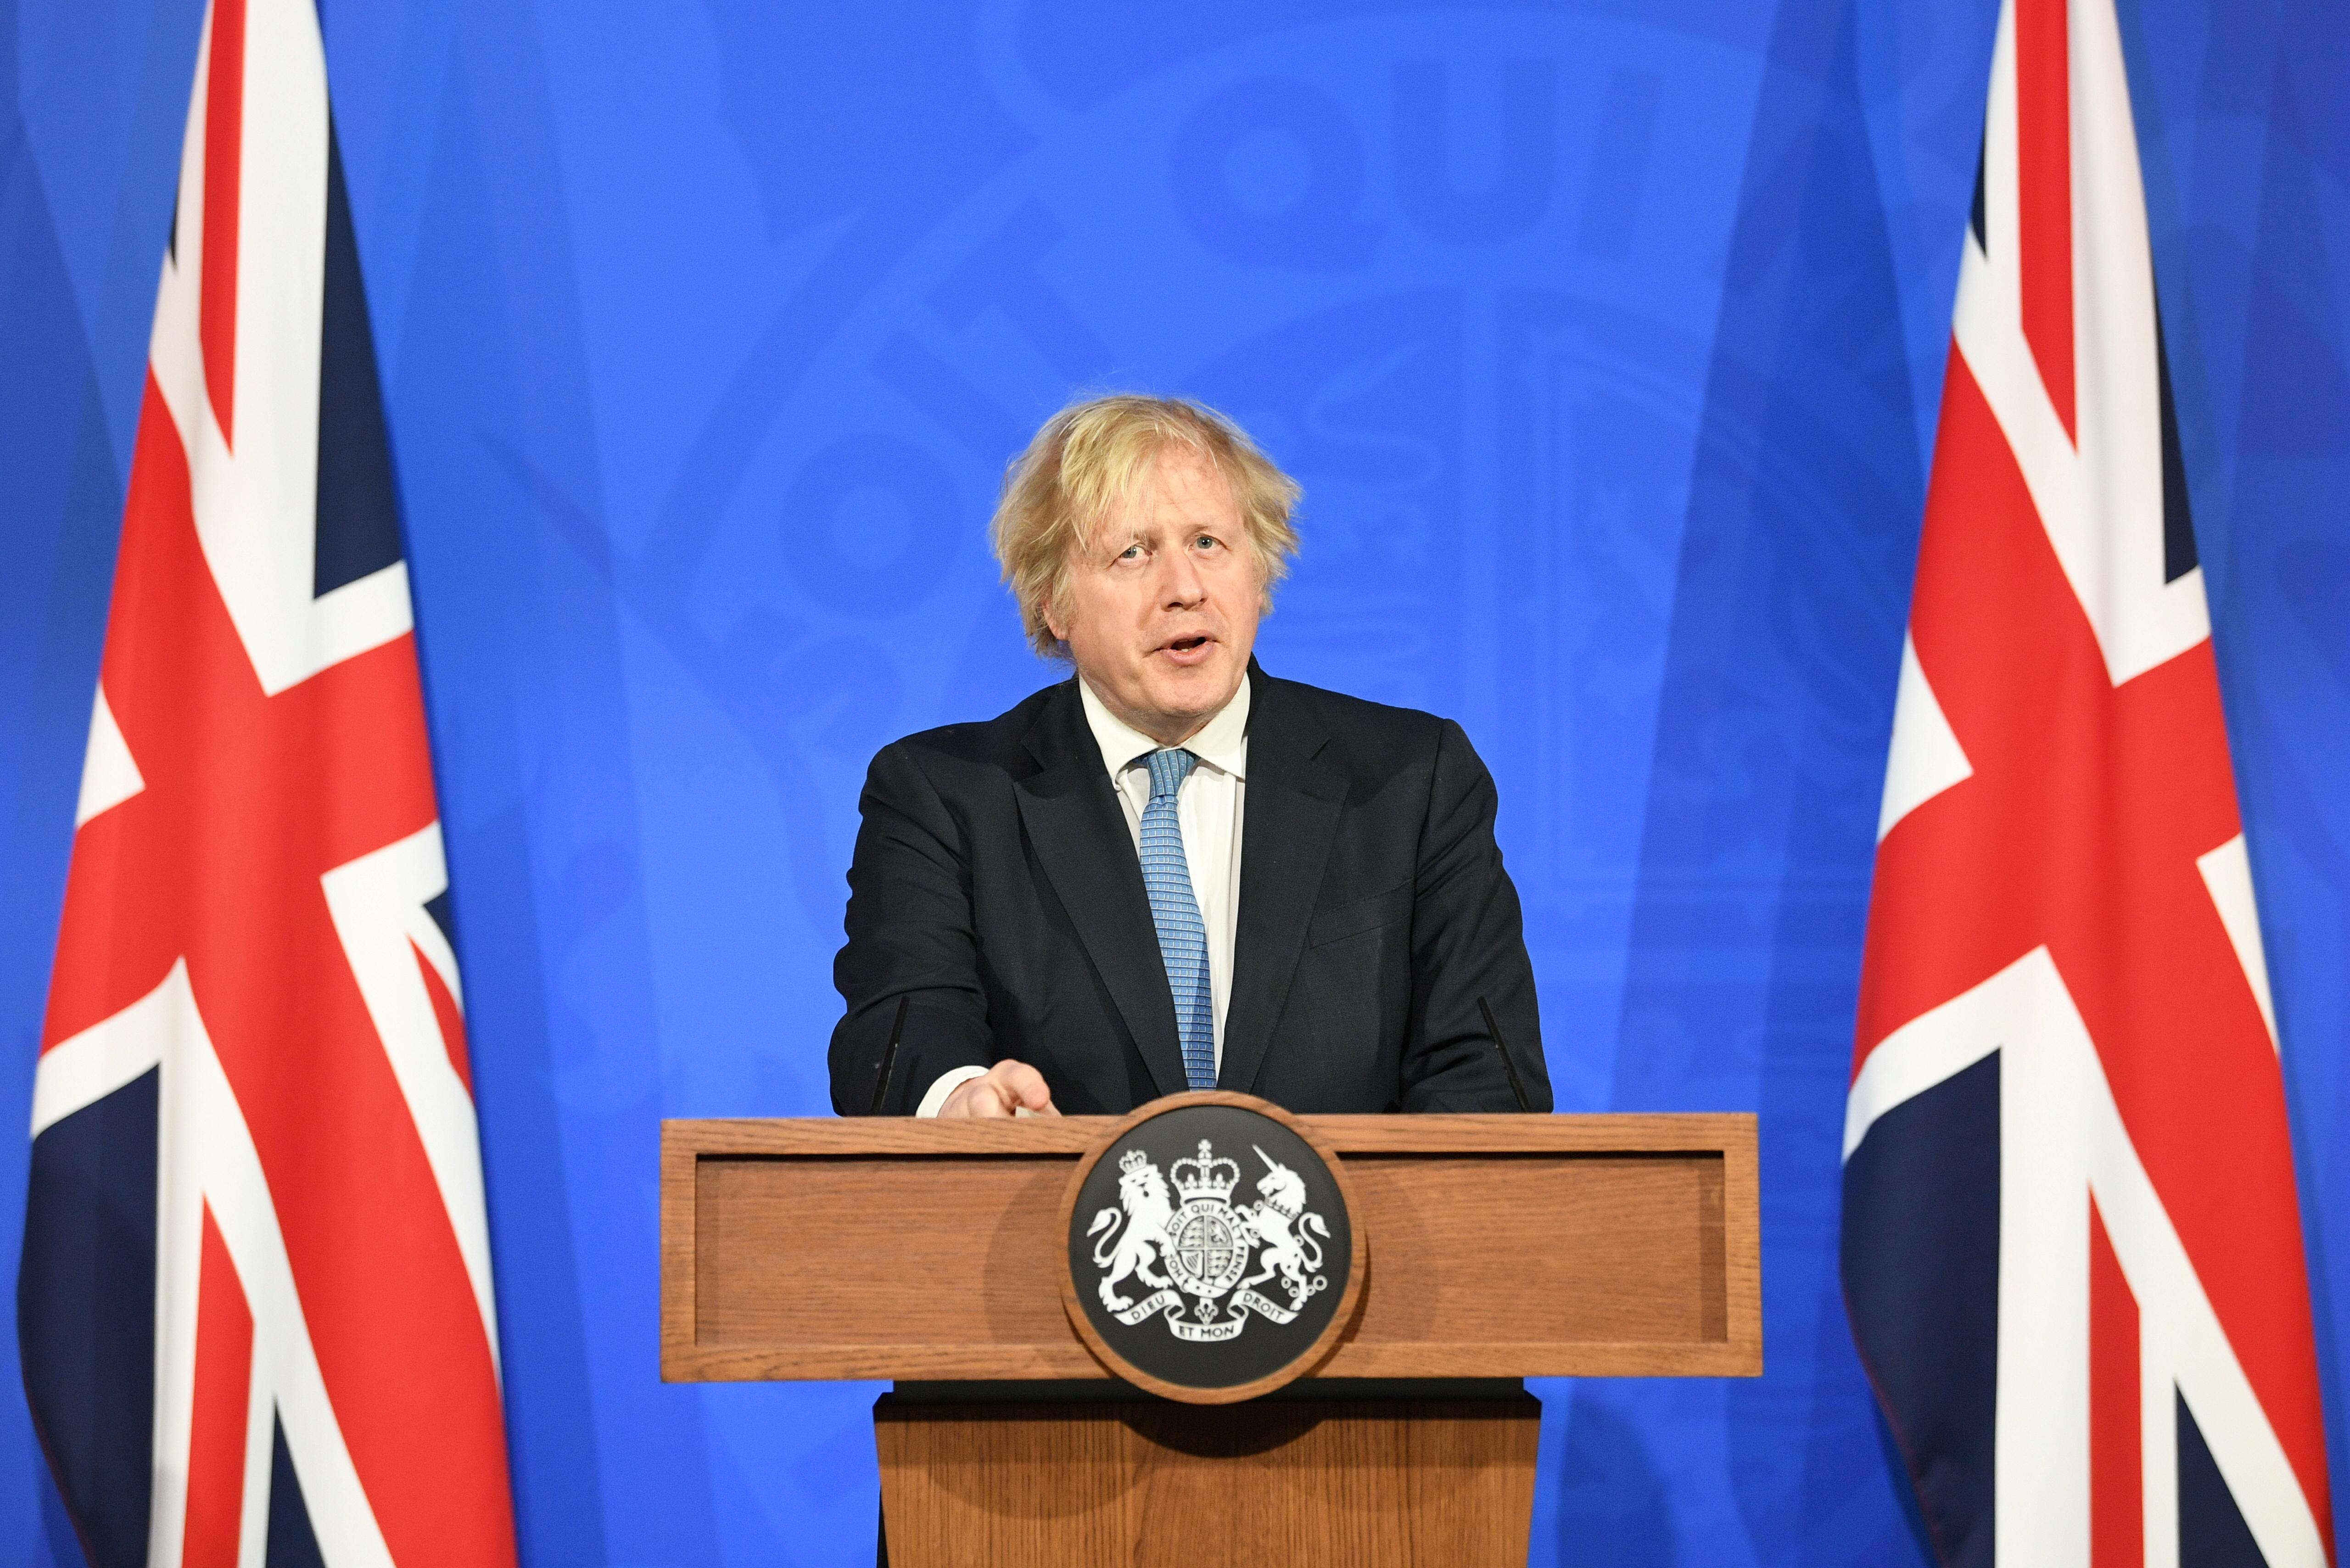 Britain's Prime Minister Boris Johnson holds a news conference on the coronavirus disease (COVID-19) pandemic, in London, Britain April 5, 2021. Stefan Rousseau/Pool via REUTERS